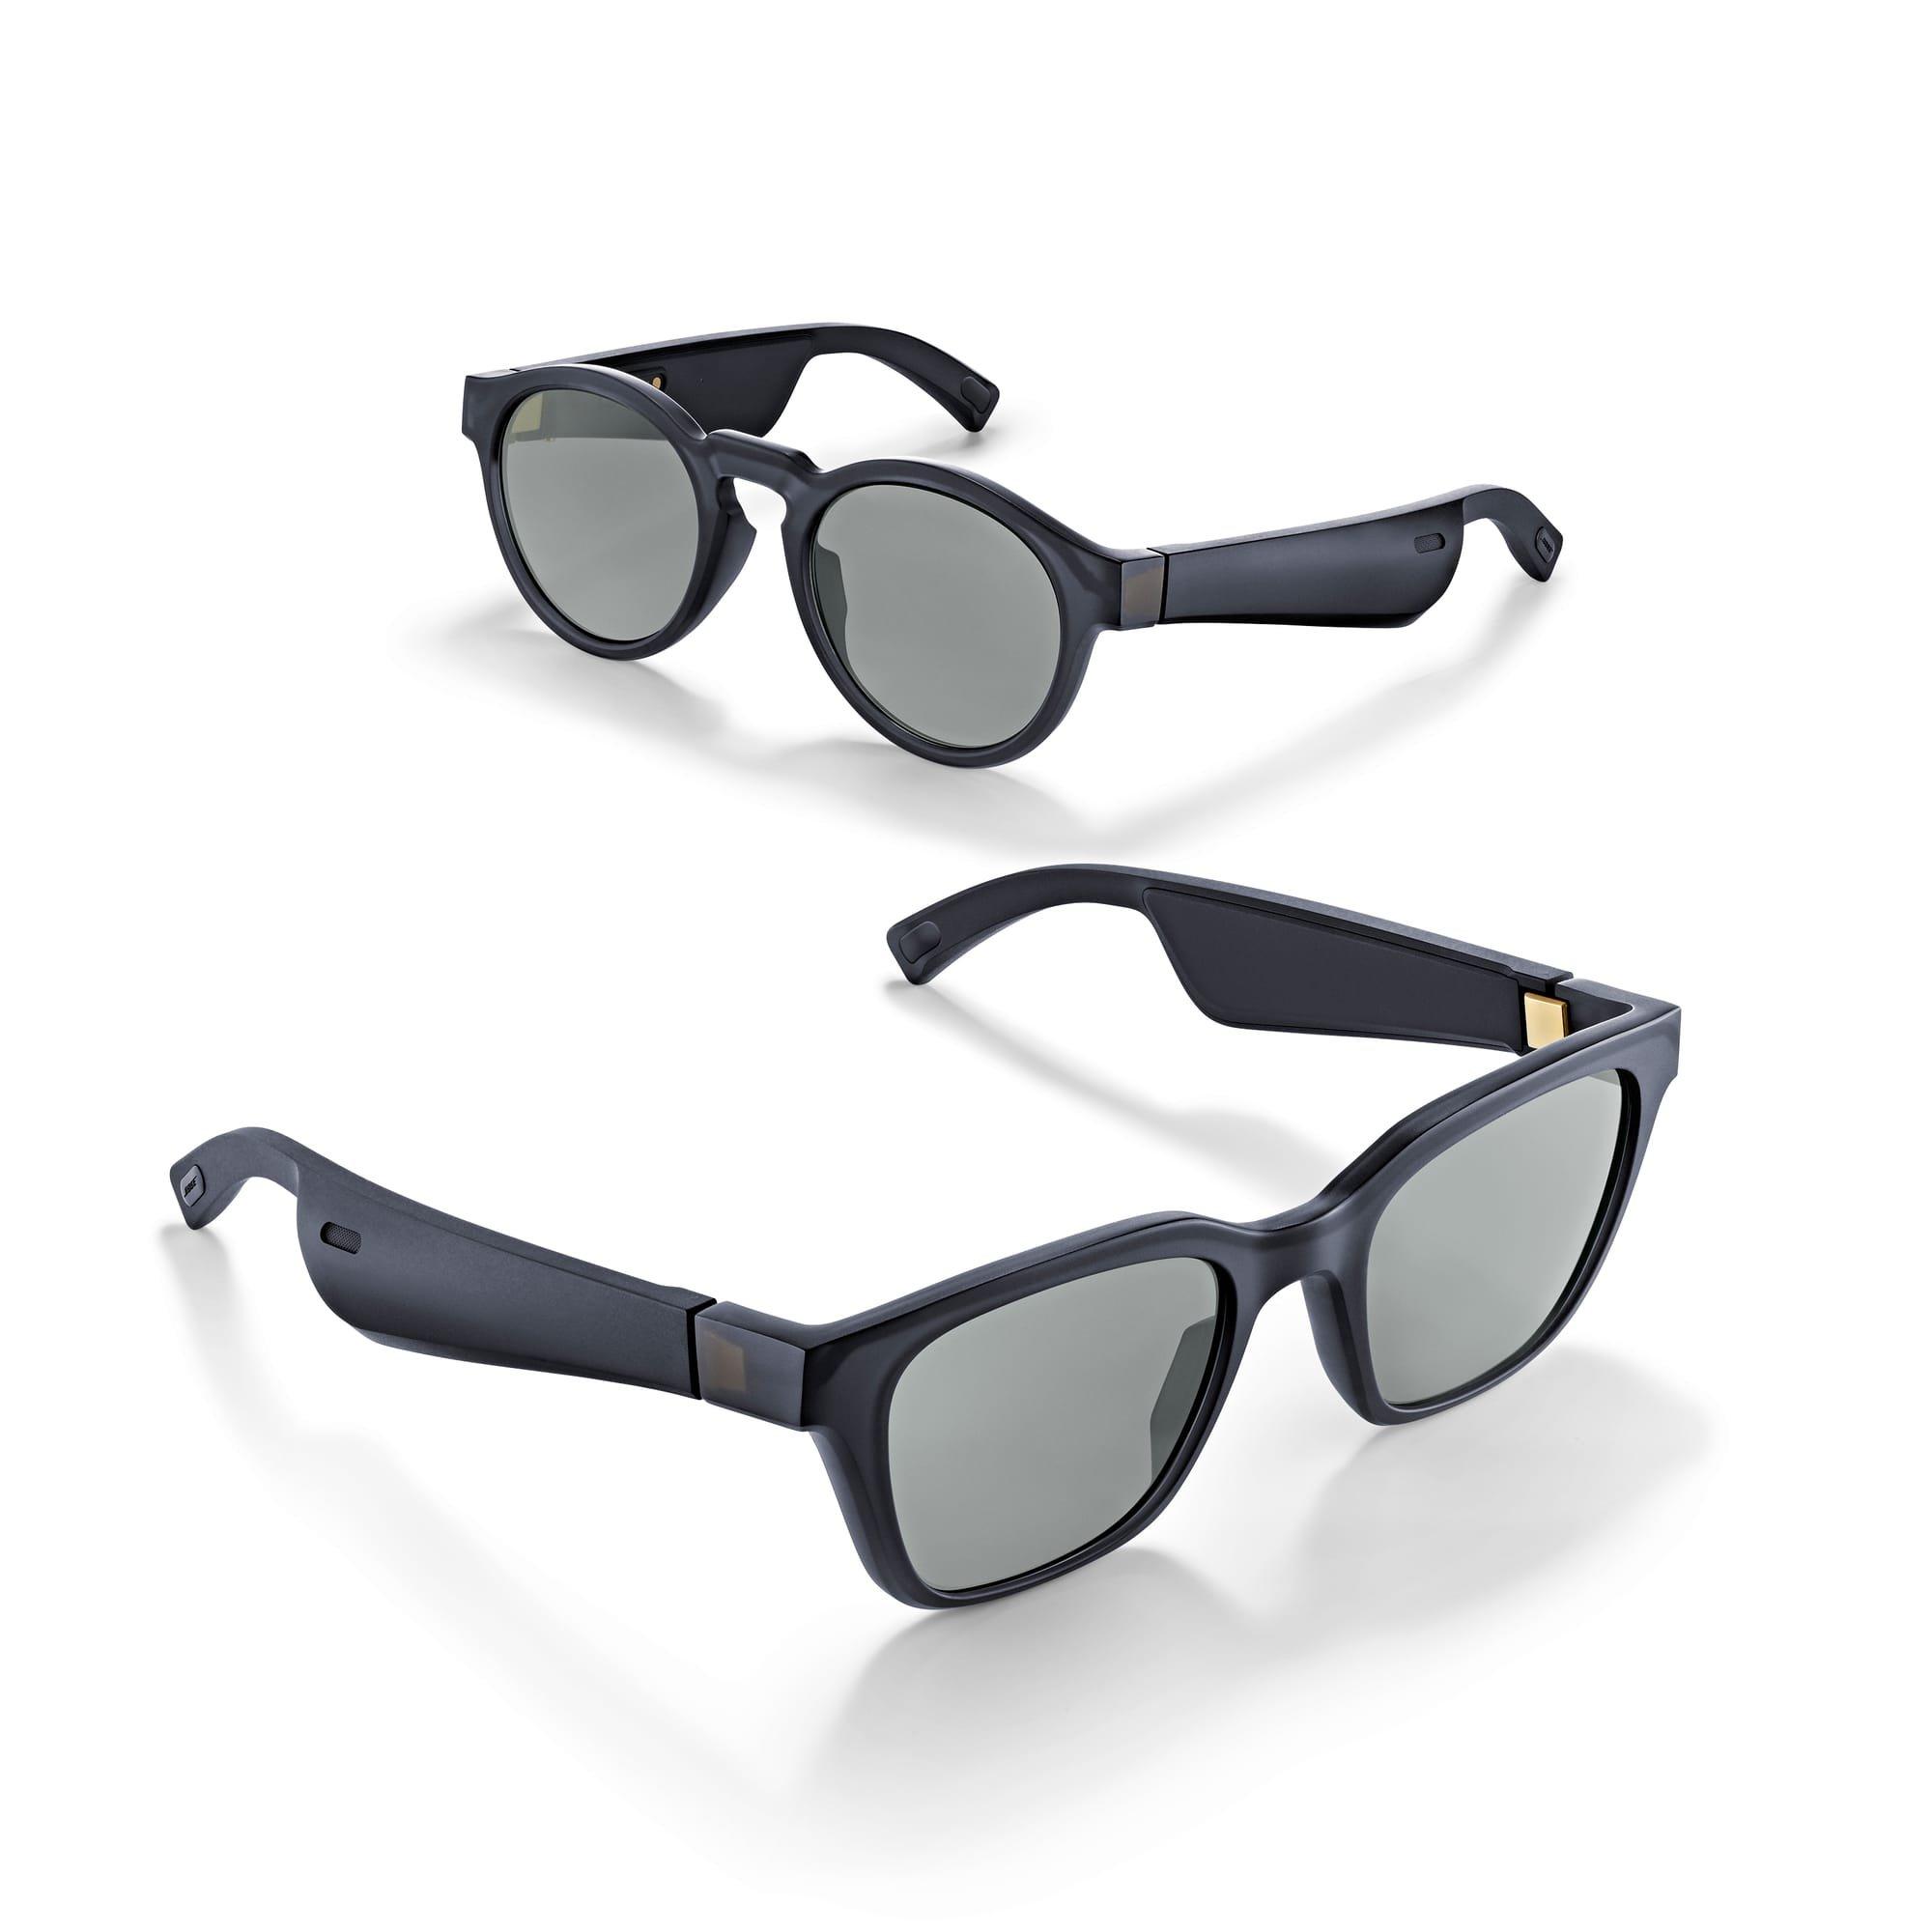 Bose Frames, Alto and Rondo models.